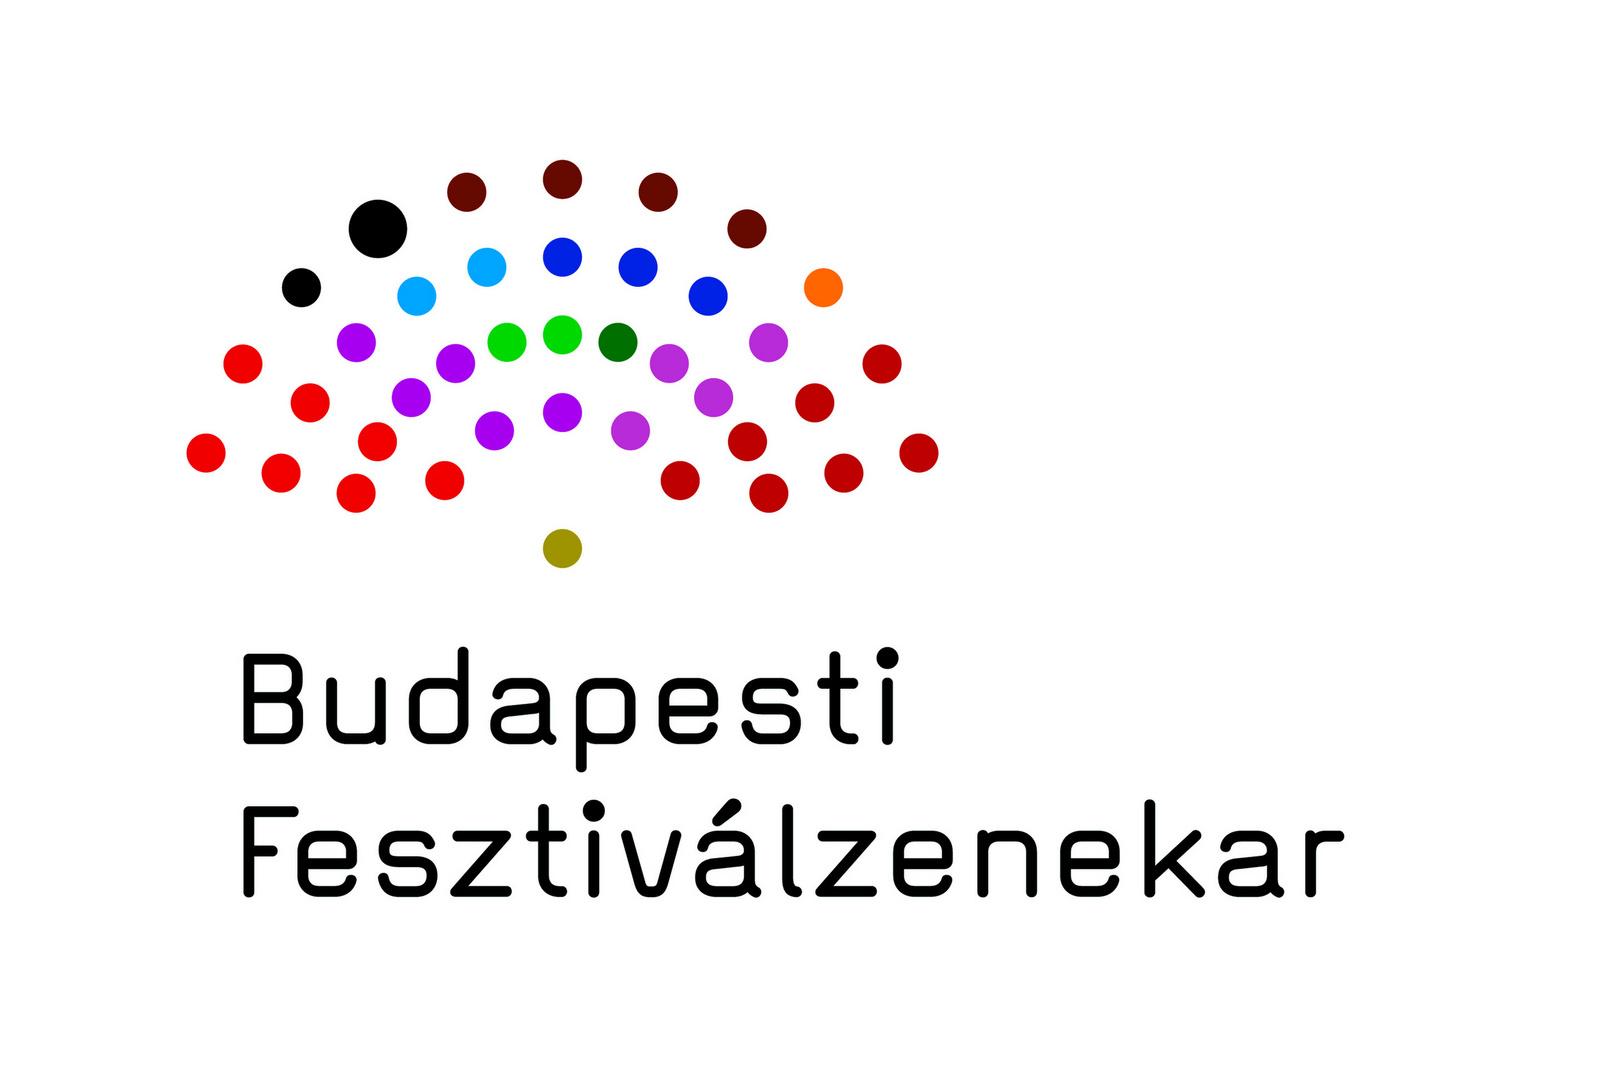 bfz-long-positive-4c